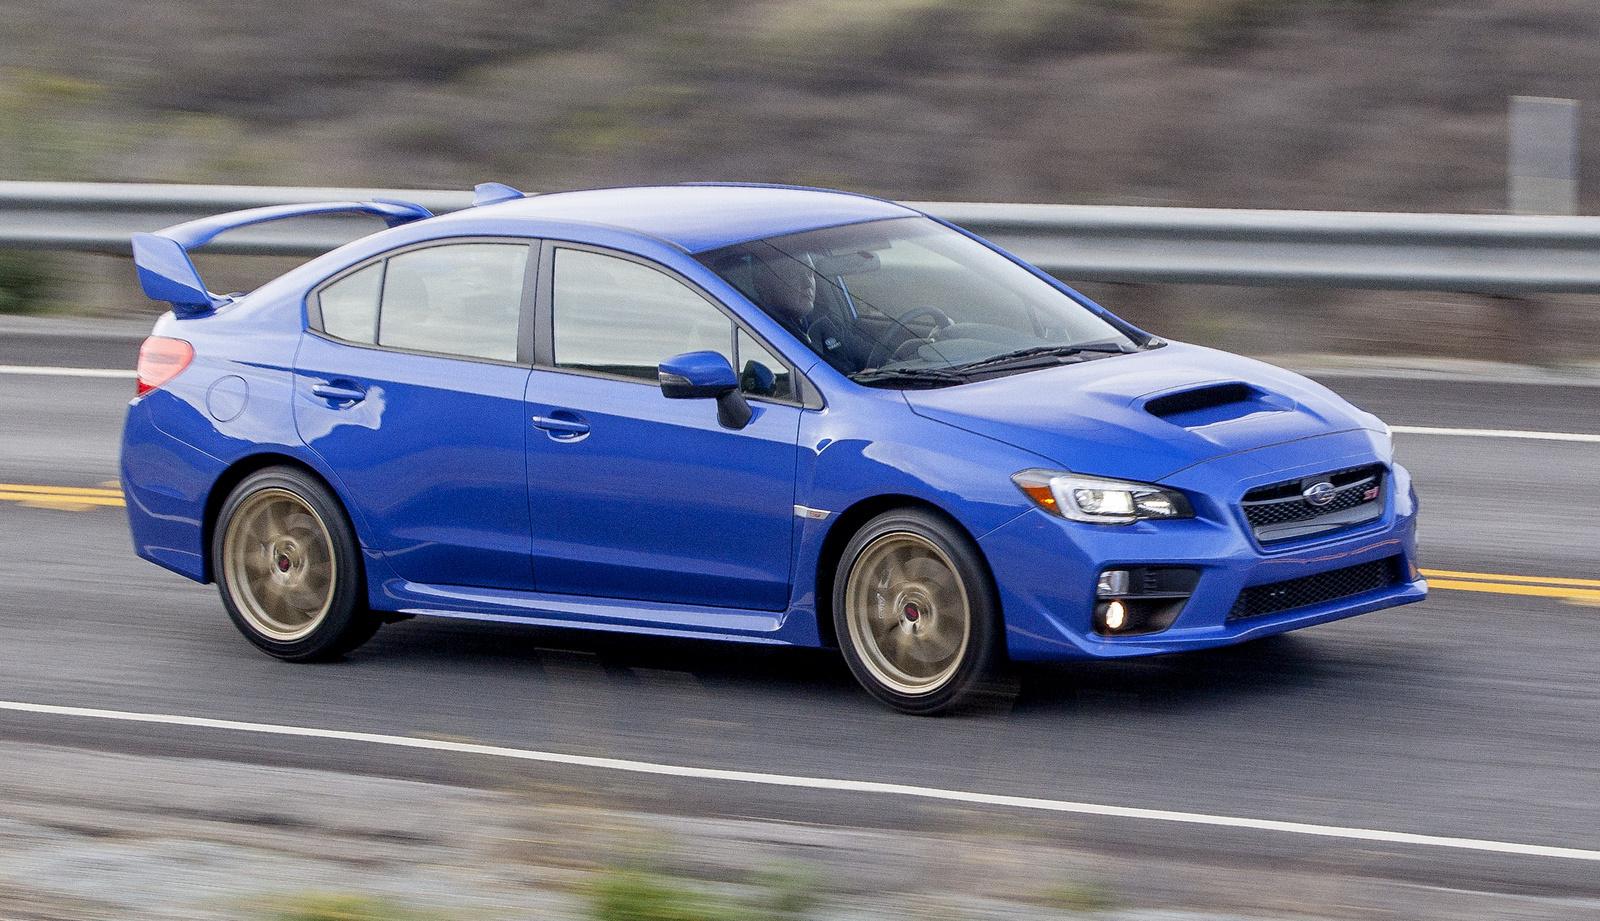 Subaru Impreza Wrx Sti Overview Cargurus